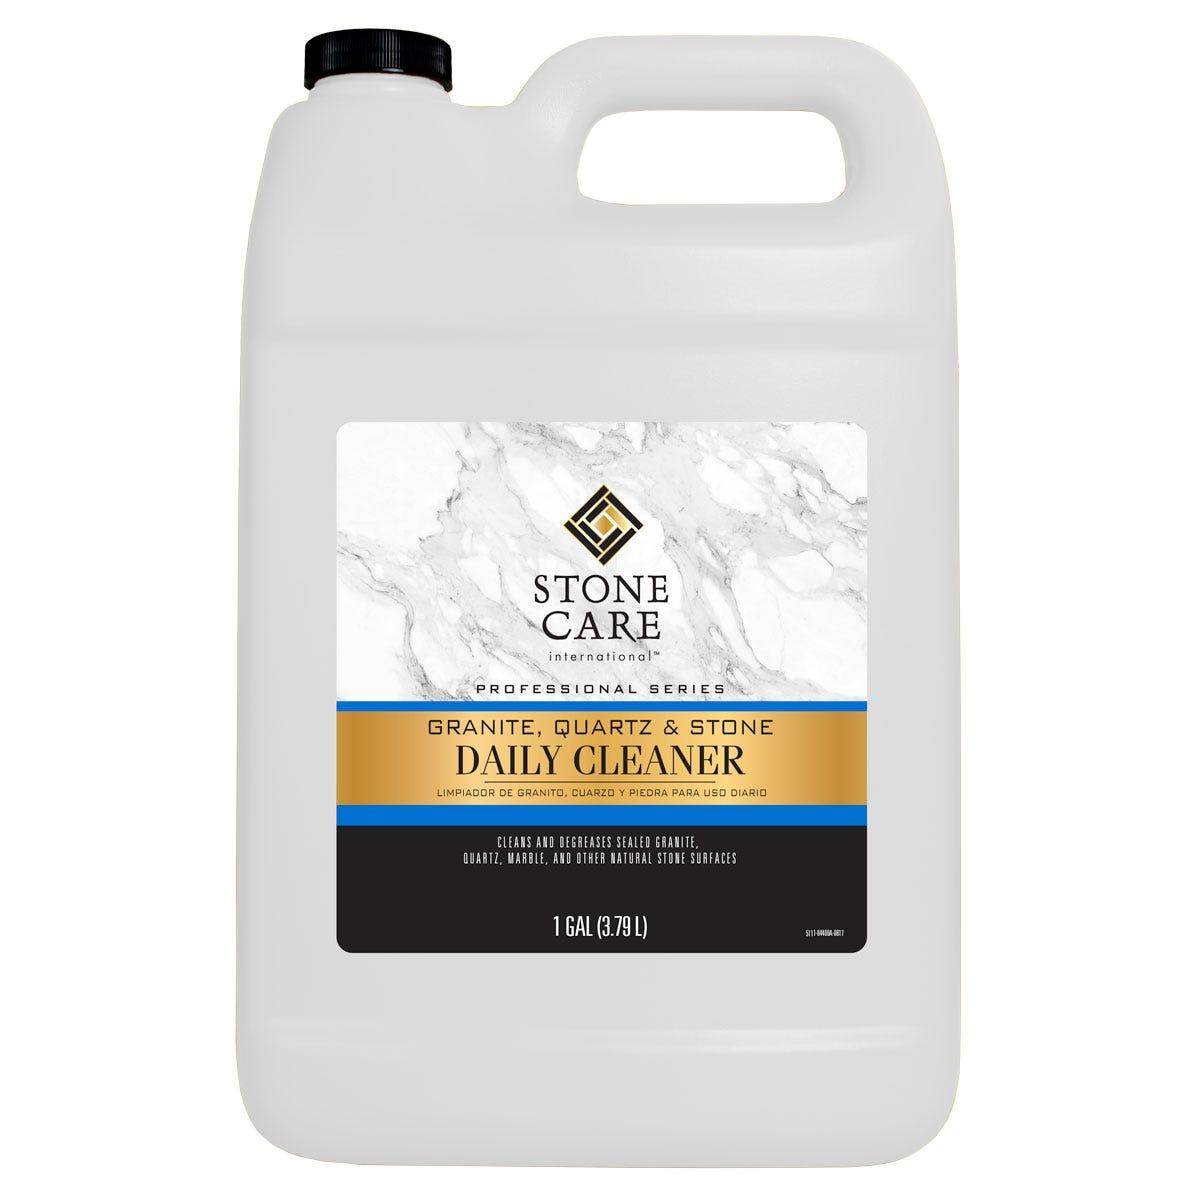 Granite, Quartz & Stone Daily Cleaner Gallon